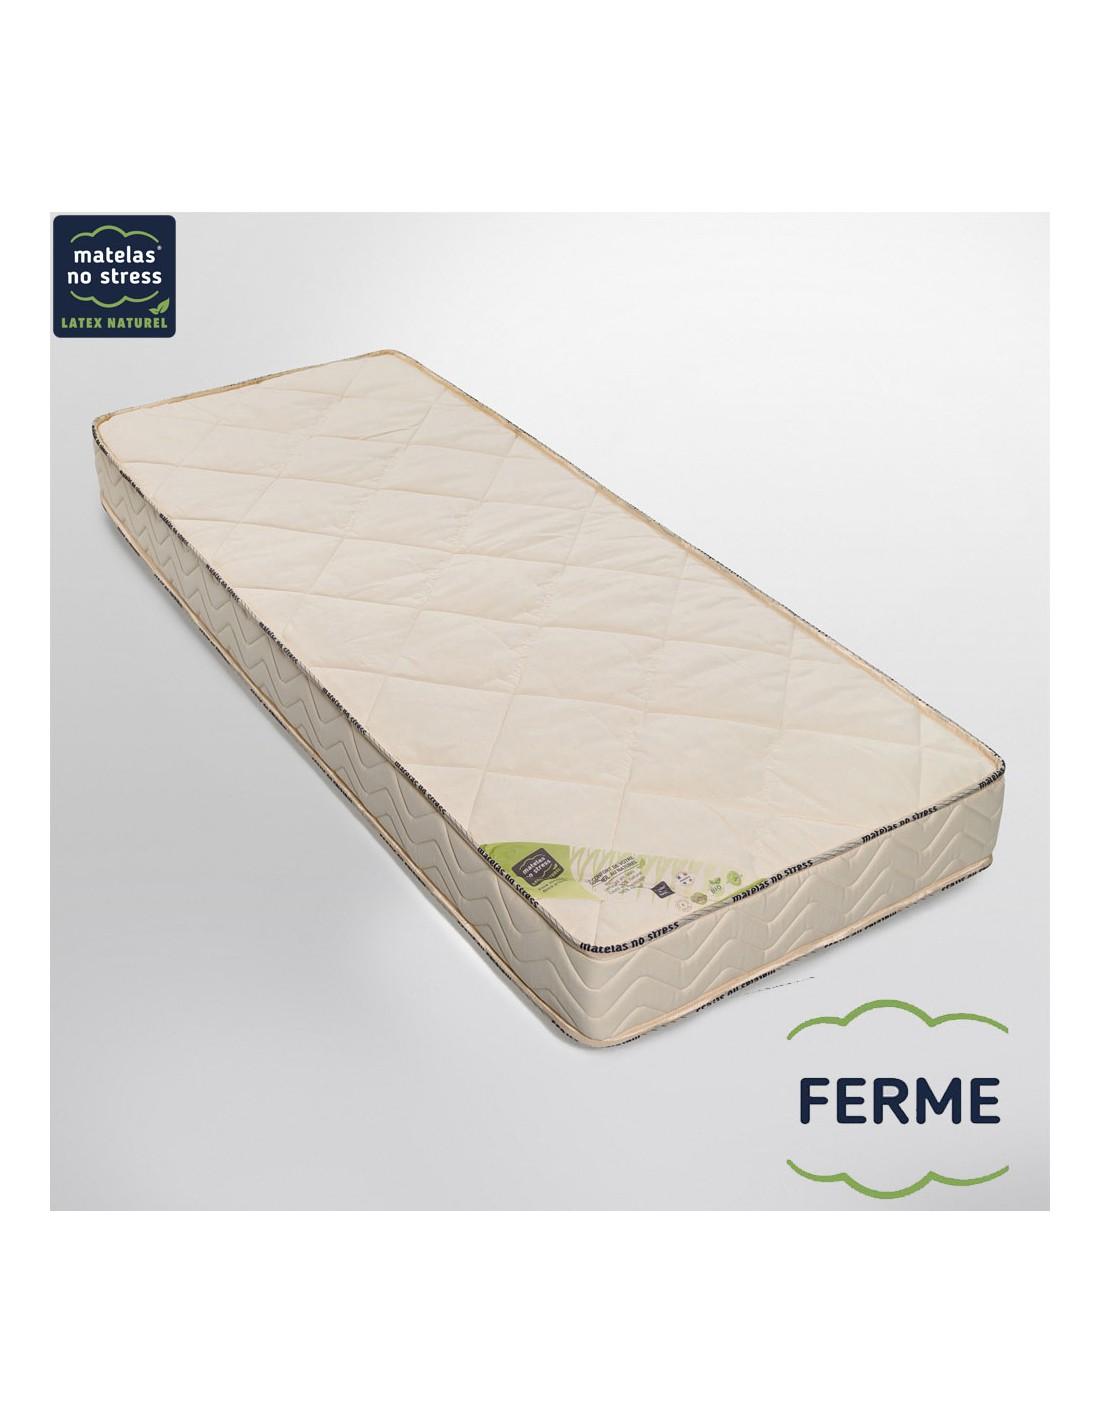 matelas bio latex naturel 100 x 200 l gance ferme 18 cm. Black Bedroom Furniture Sets. Home Design Ideas